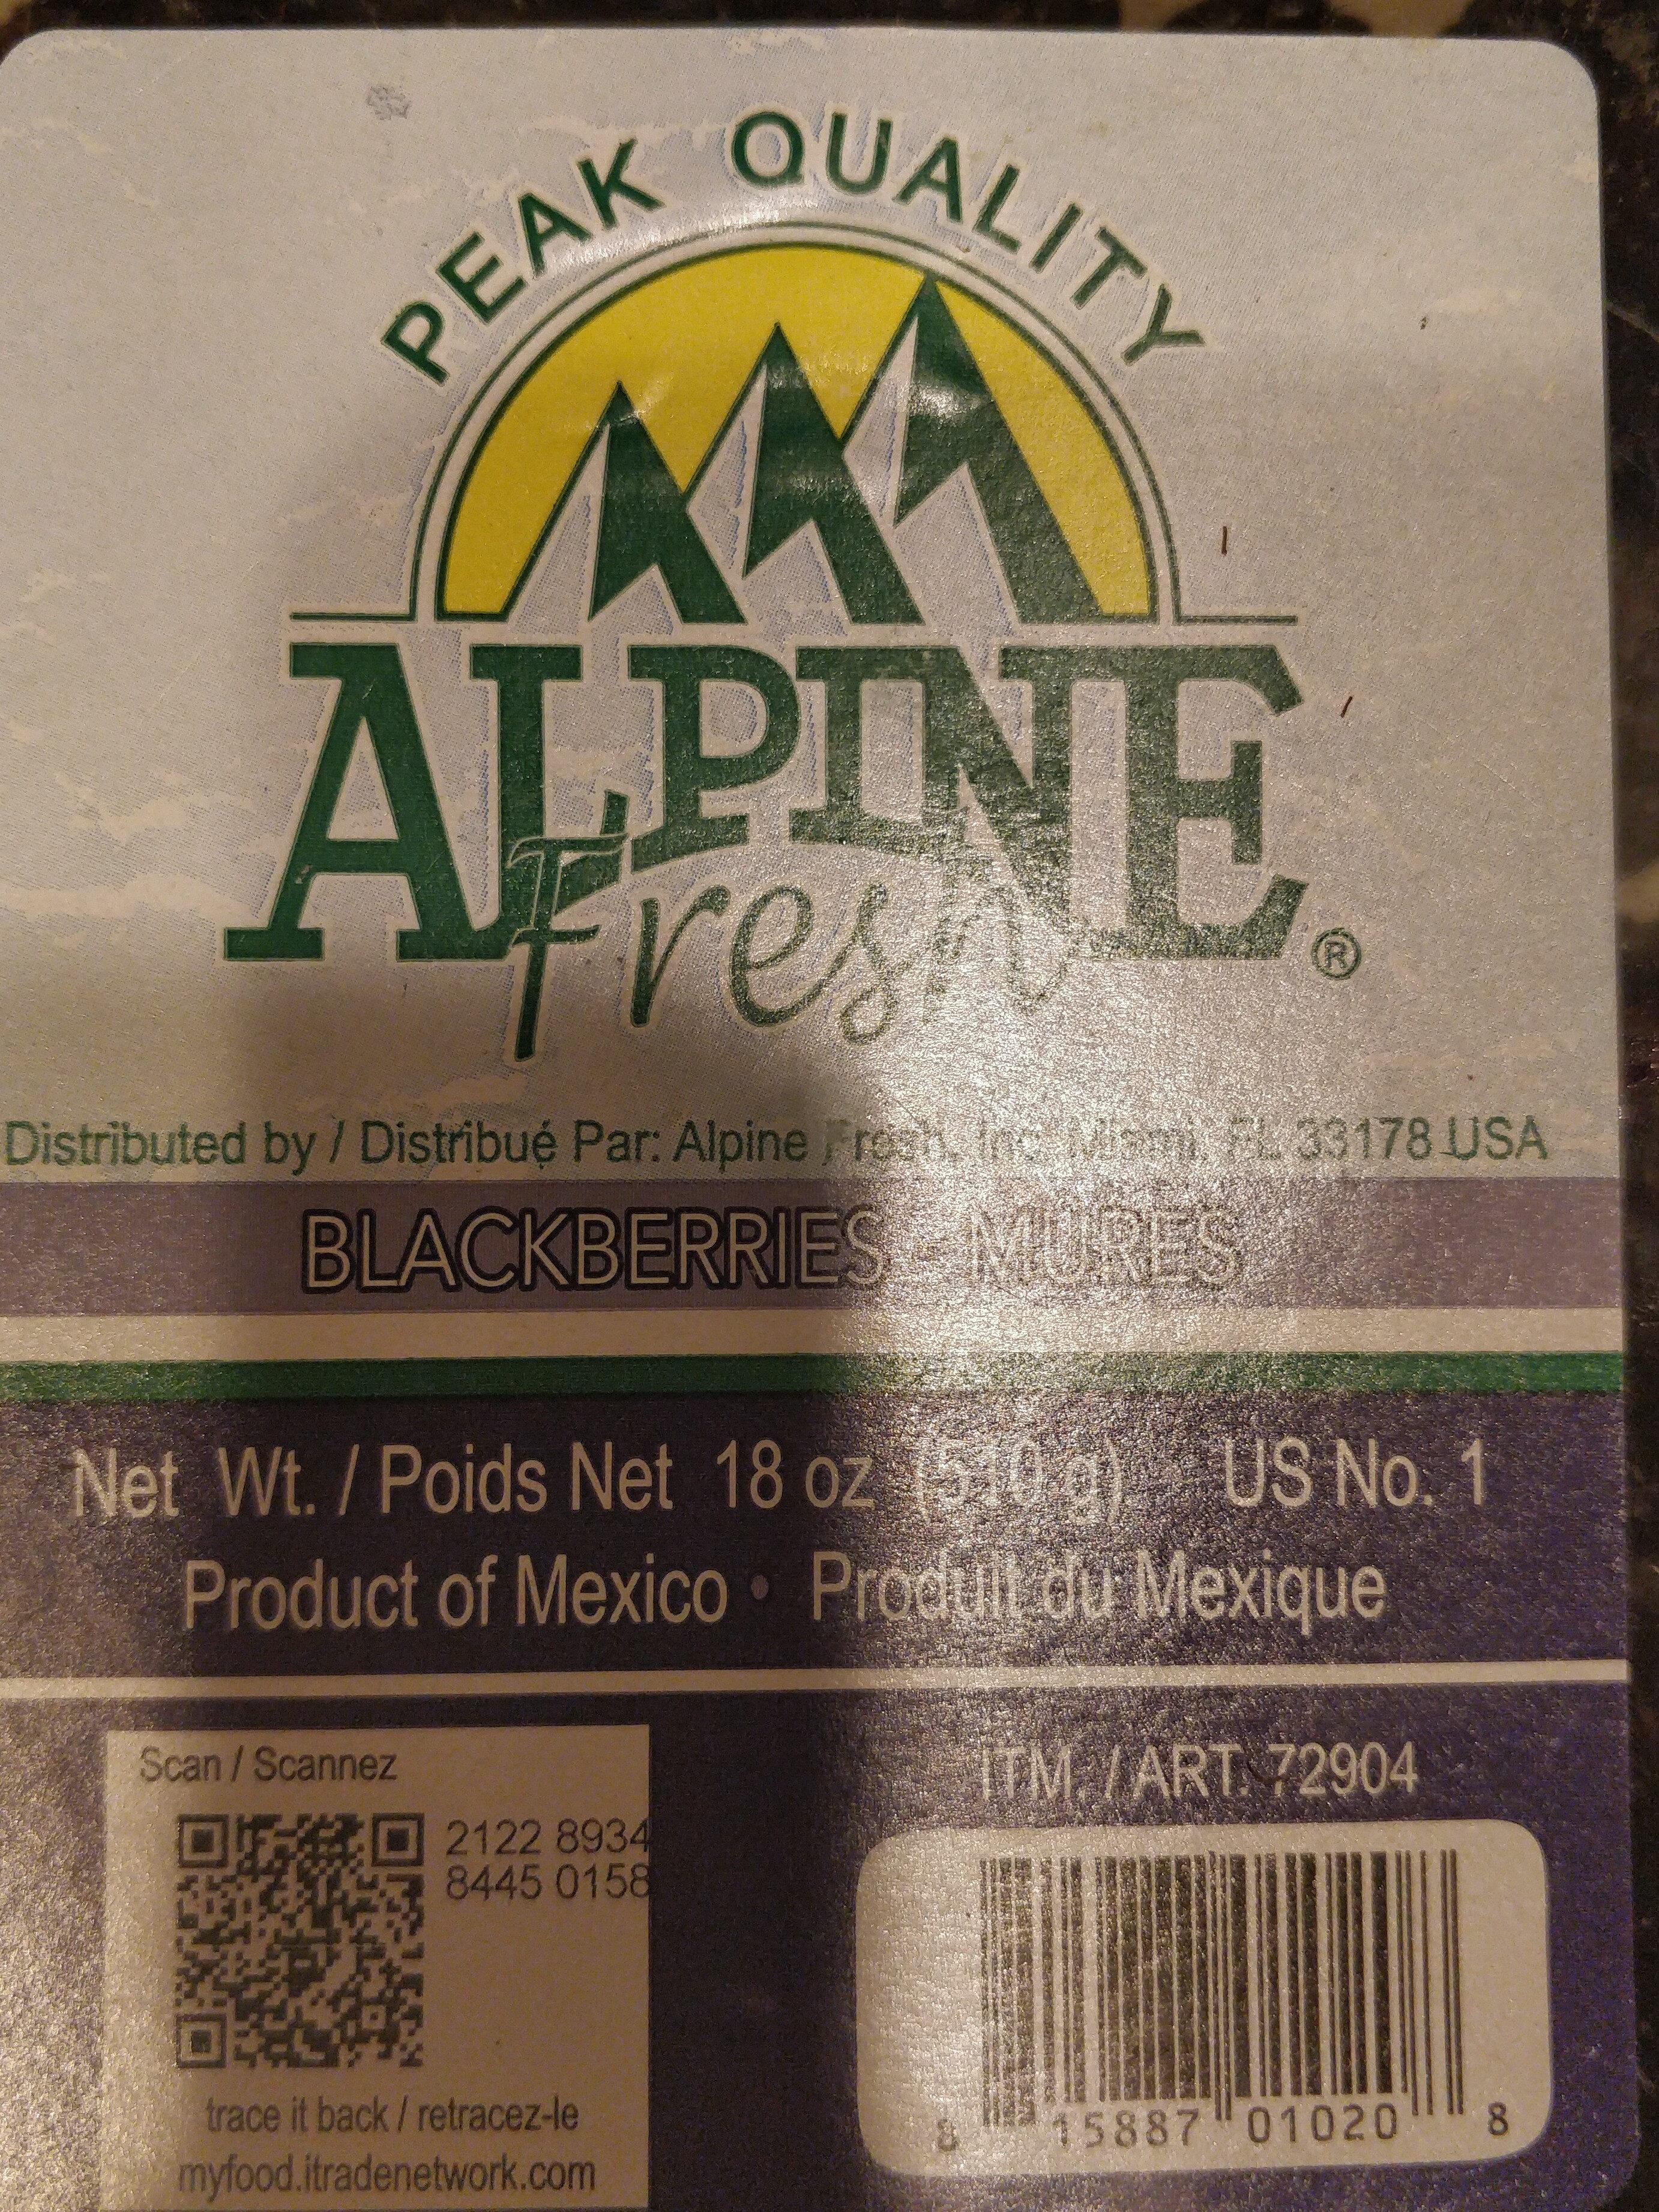 Alpine Fresh Blackberries - Product